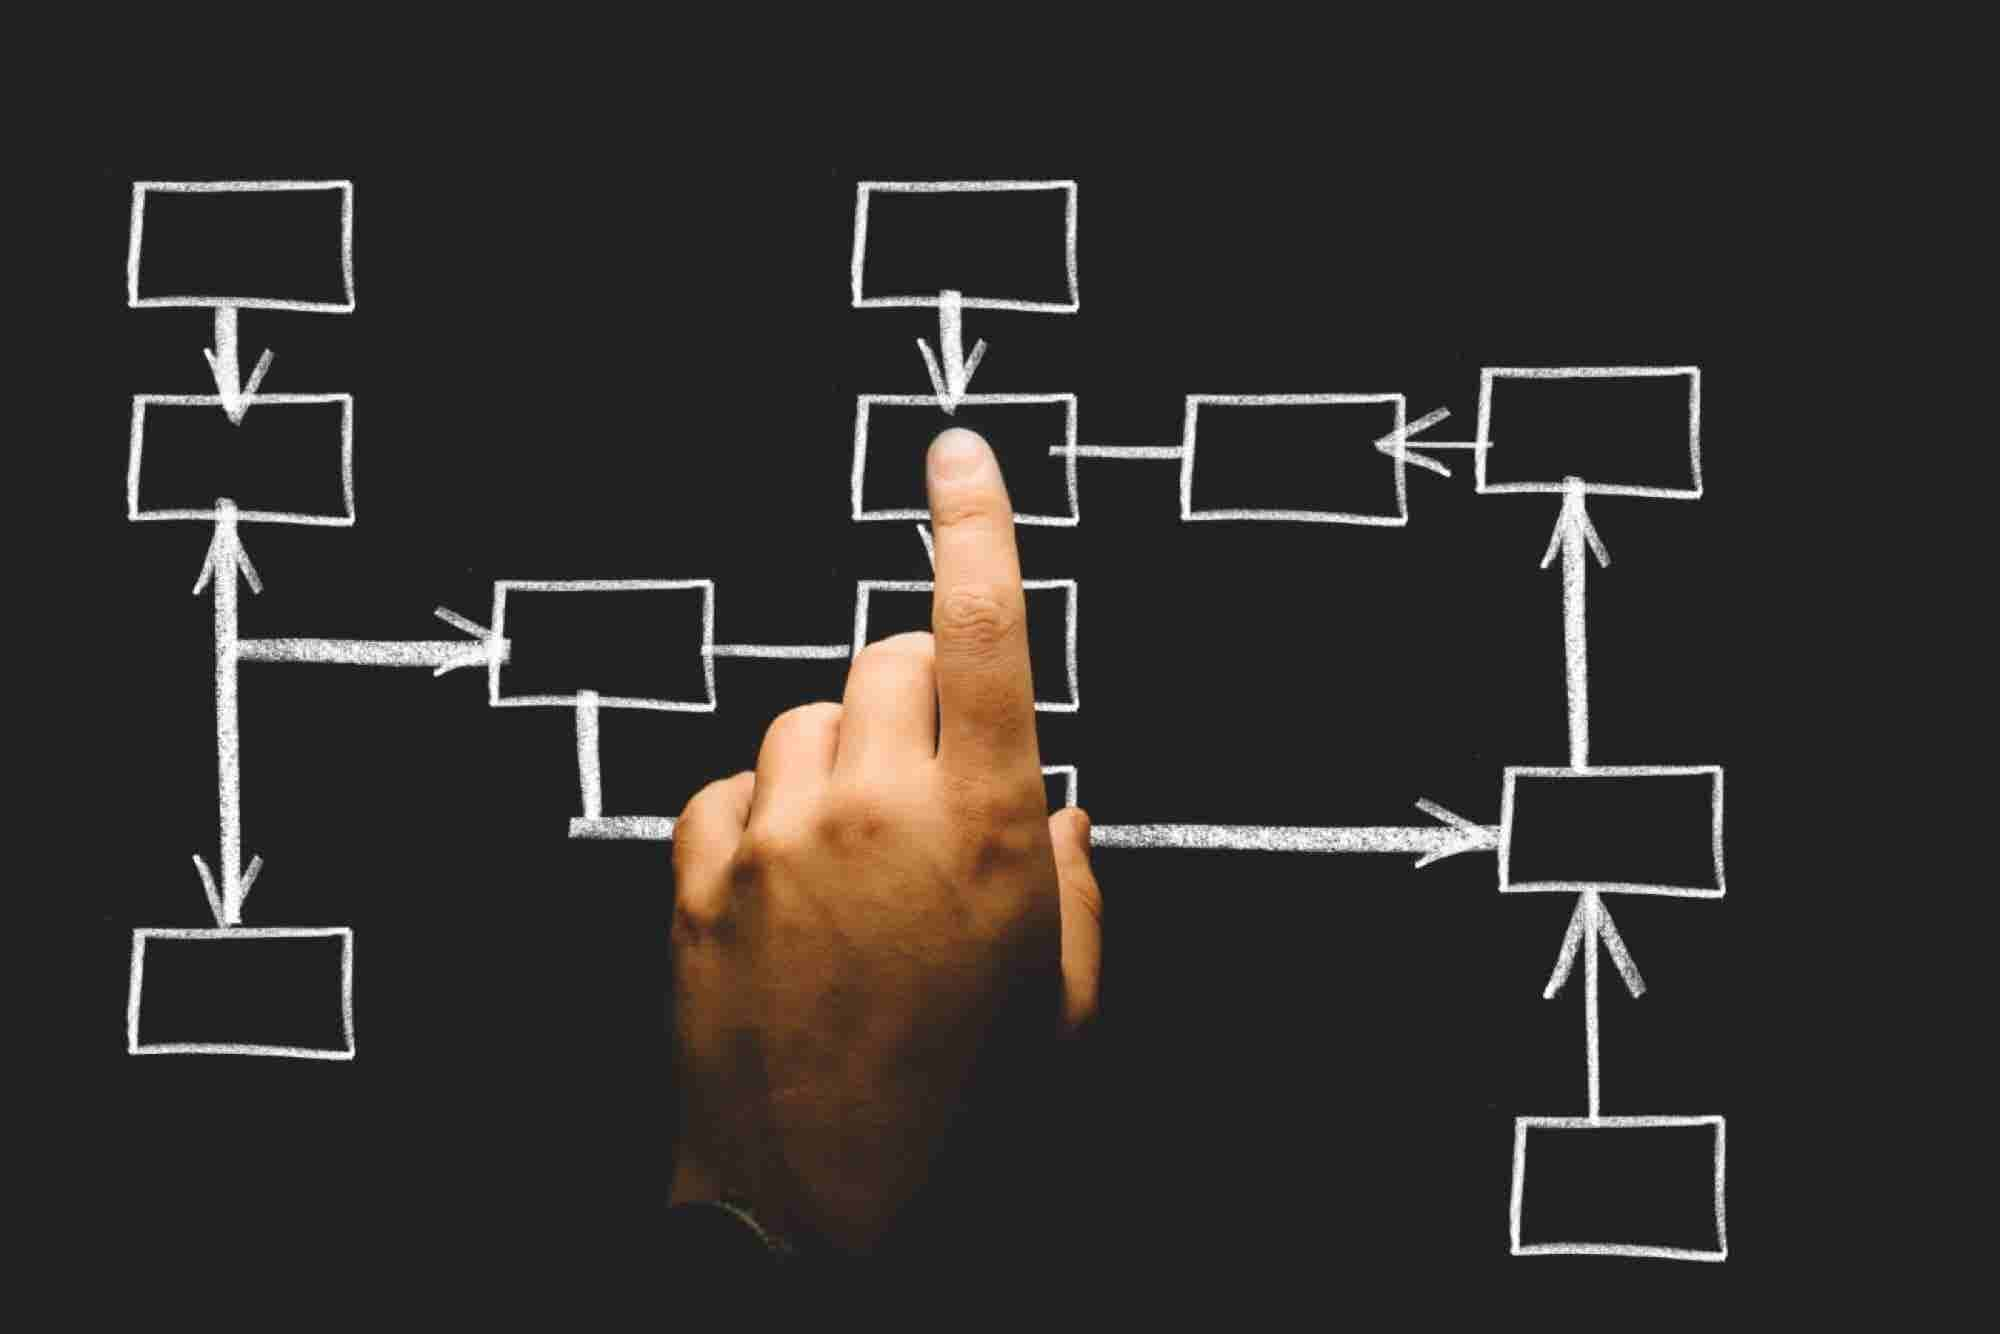 6 Ways to Setup a Structure for Entrepreneurship